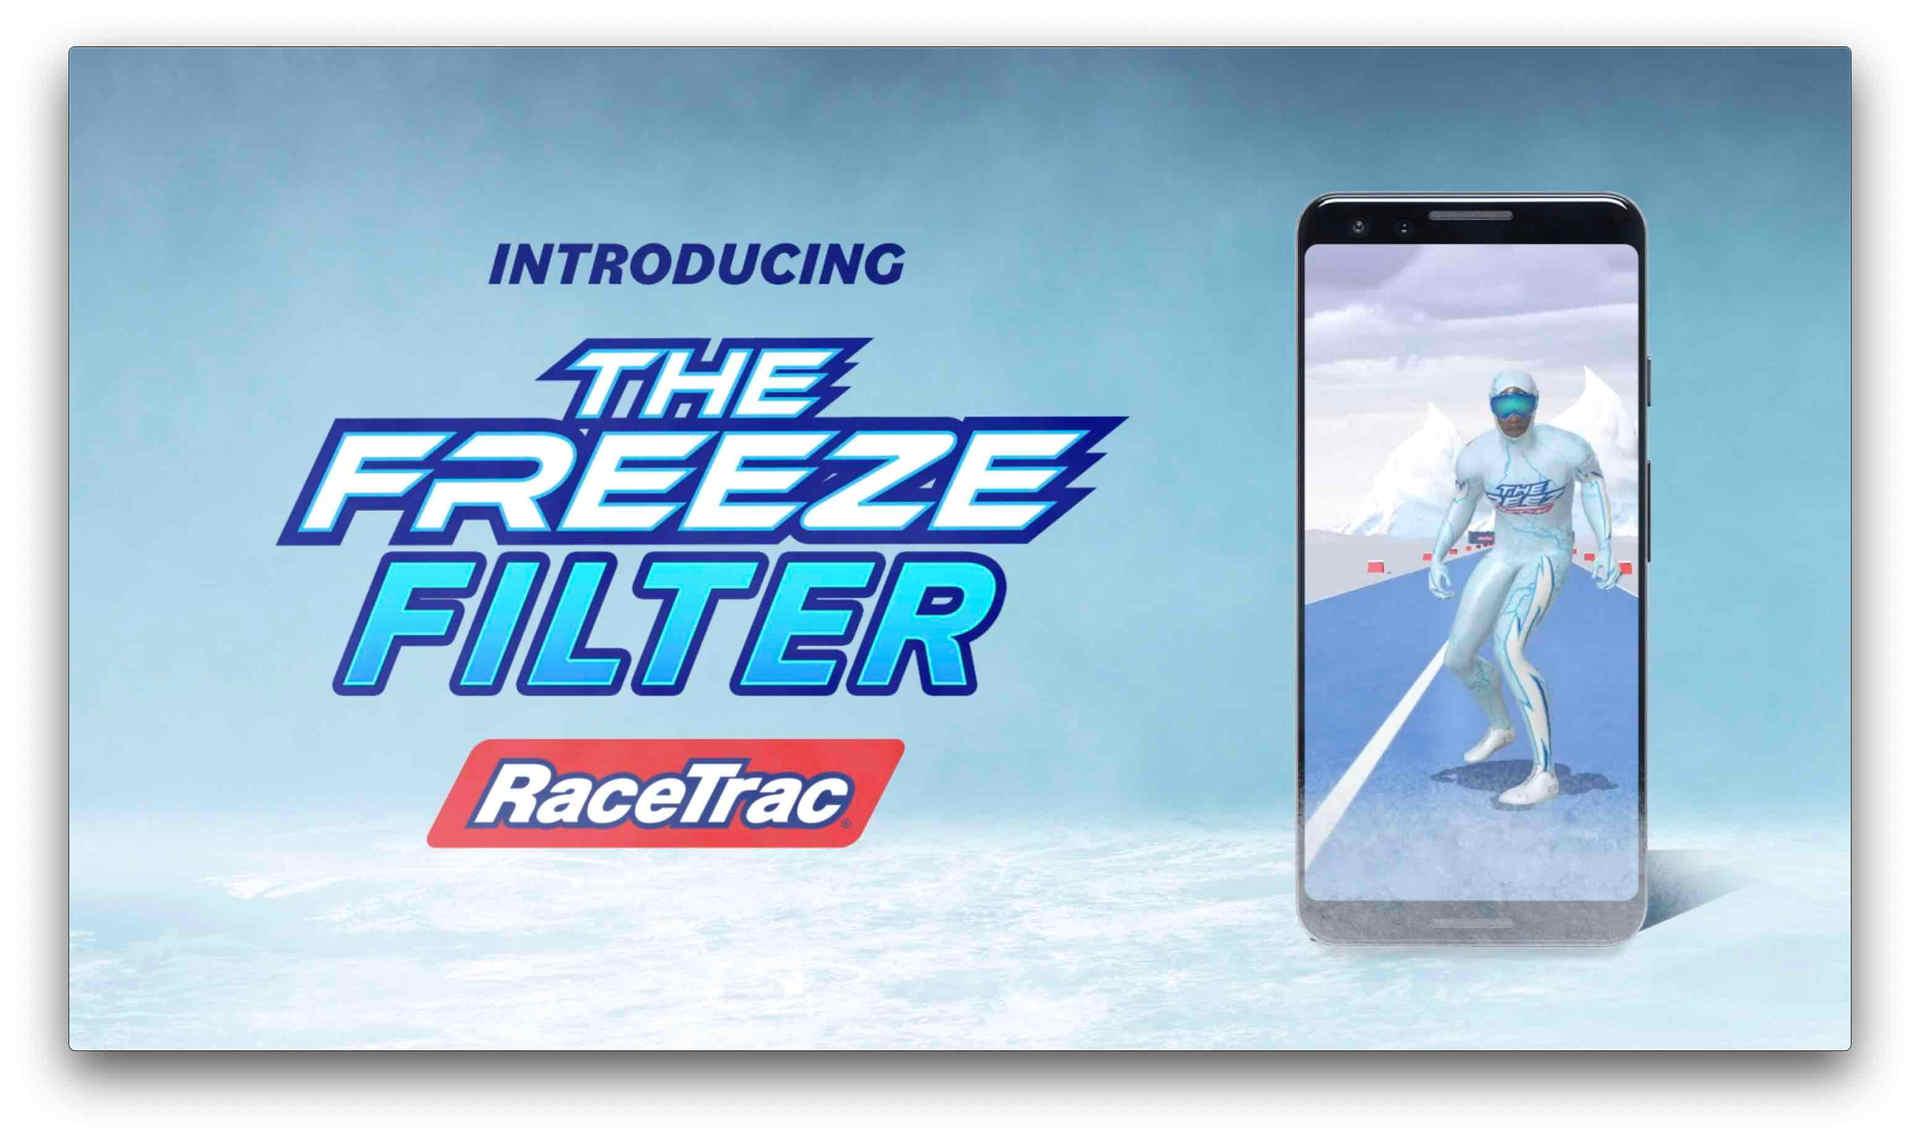 RACETRAC - Freeze Filter Campaign